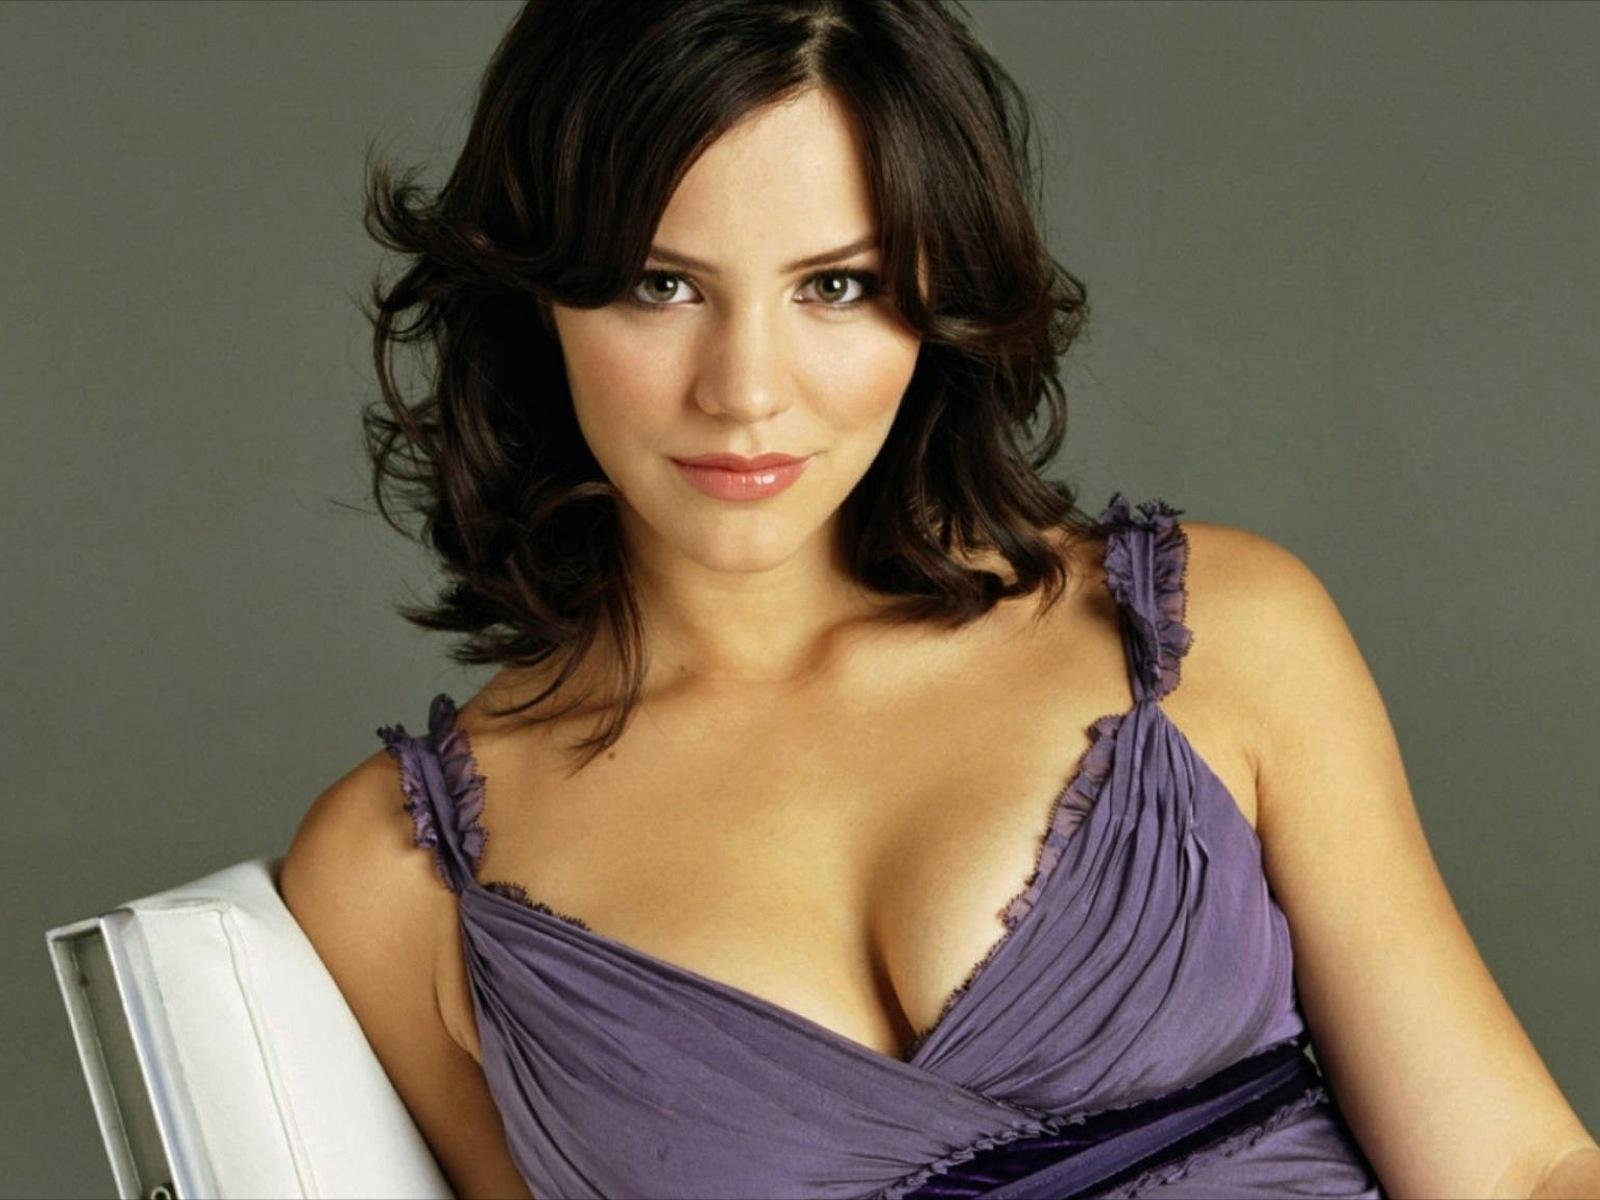 http://1.bp.blogspot.com/-G3lRlcyORz8/Tgs7Y6IdvgI/AAAAAAAAAmg/iuVJZoLSPsM/s1600/Katharine_Mcphee.jpg